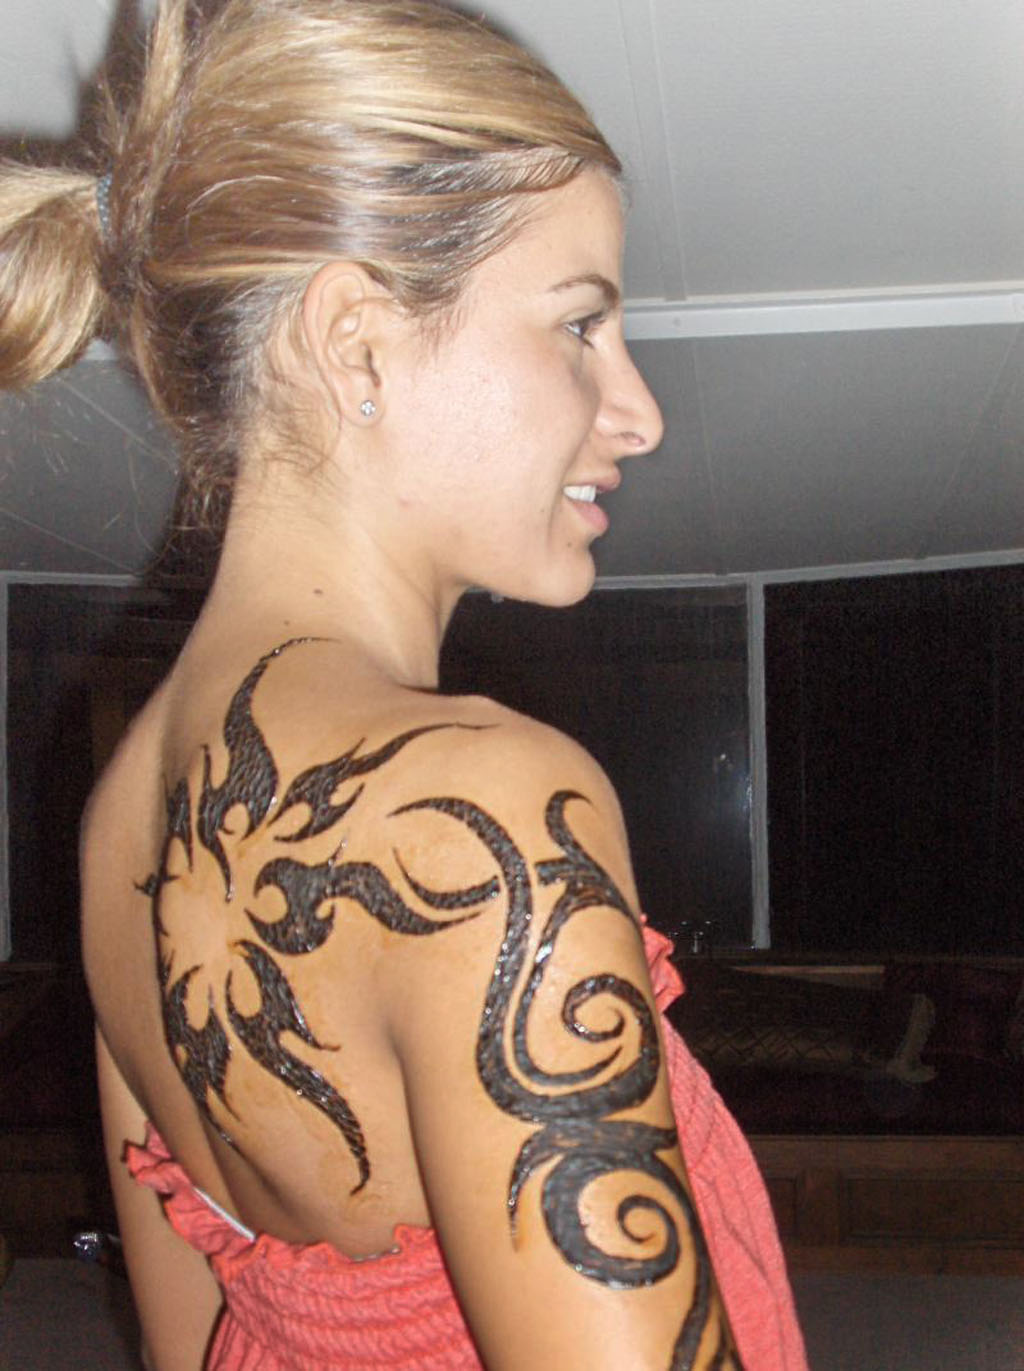 tribal shoulders tattoos for women 2013female tattoos gallery. Black Bedroom Furniture Sets. Home Design Ideas